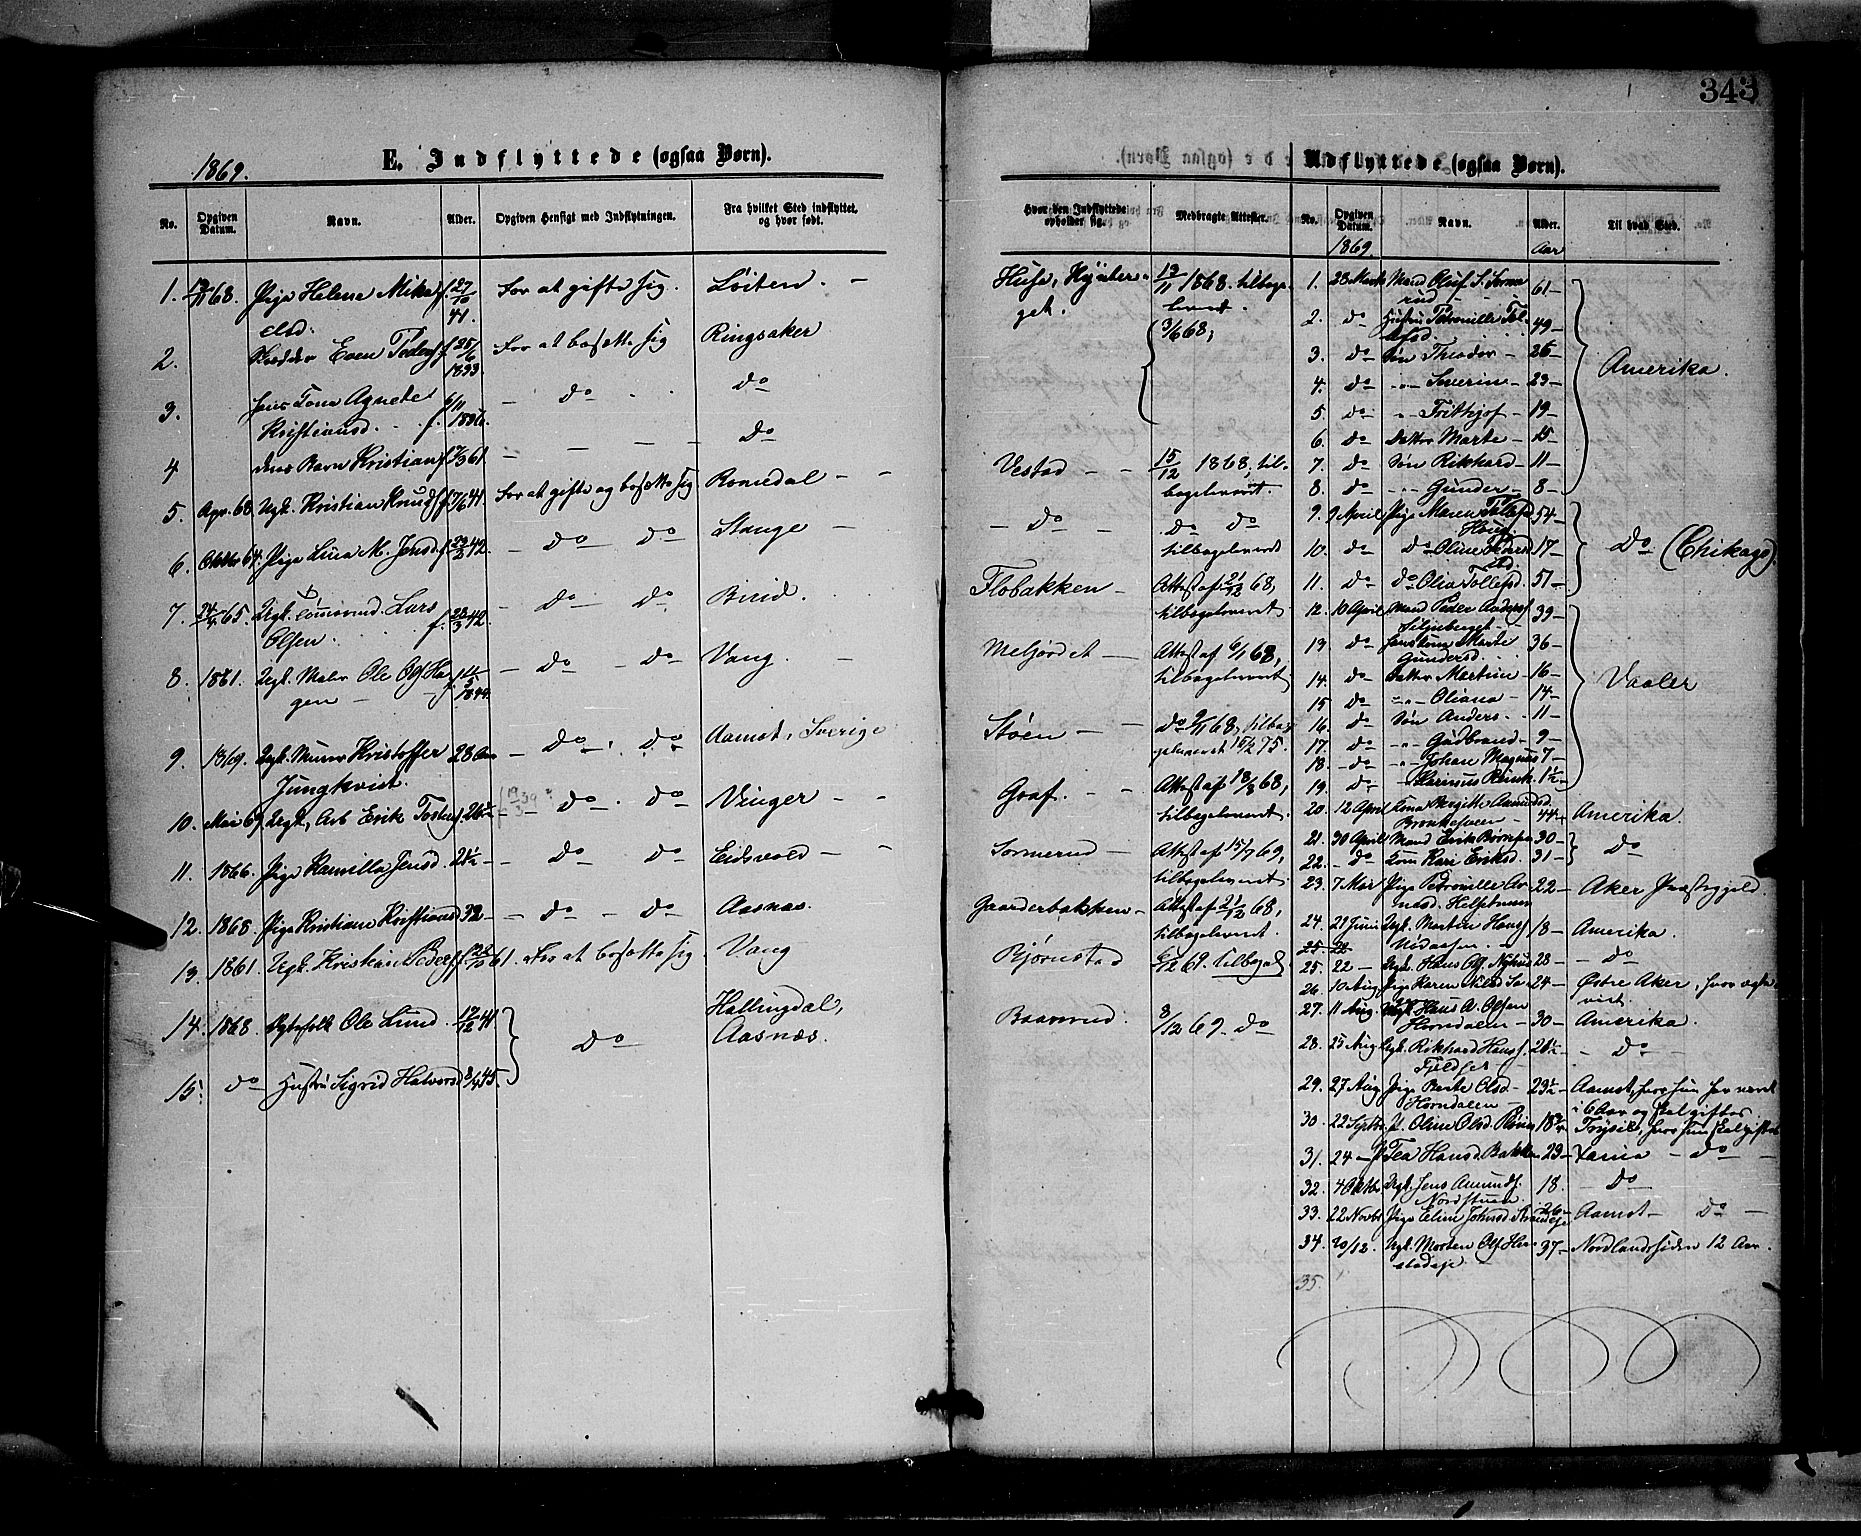 SAH, Elverum prestekontor, H/Ha/Haa/L0011: Ministerialbok nr. 11, 1869-1879, s. 343